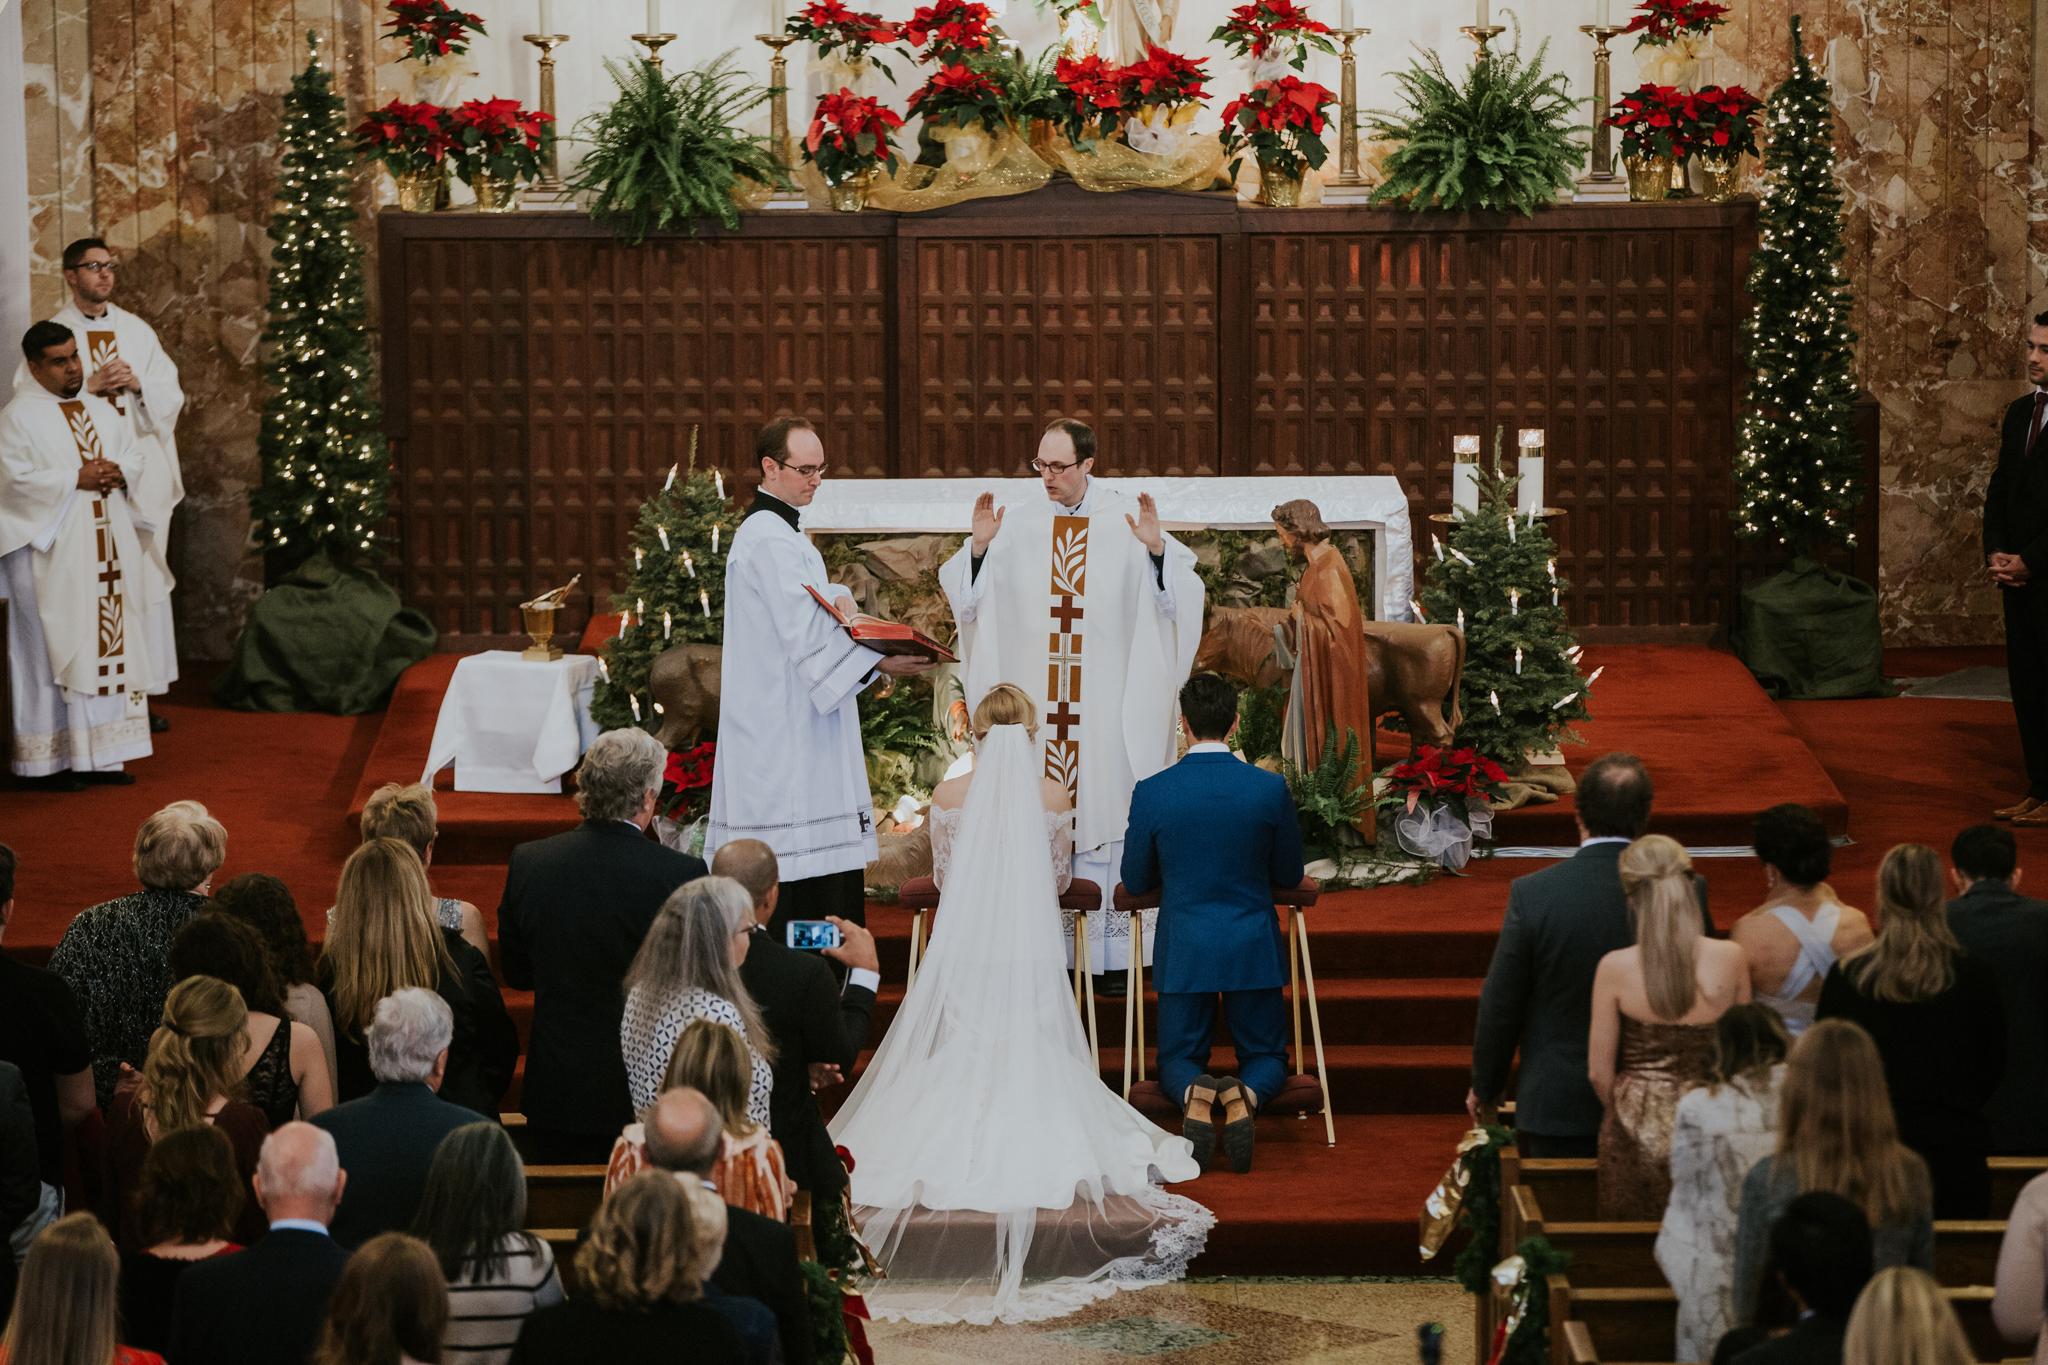 20151230_hussem_wedding_0577_web.jpg